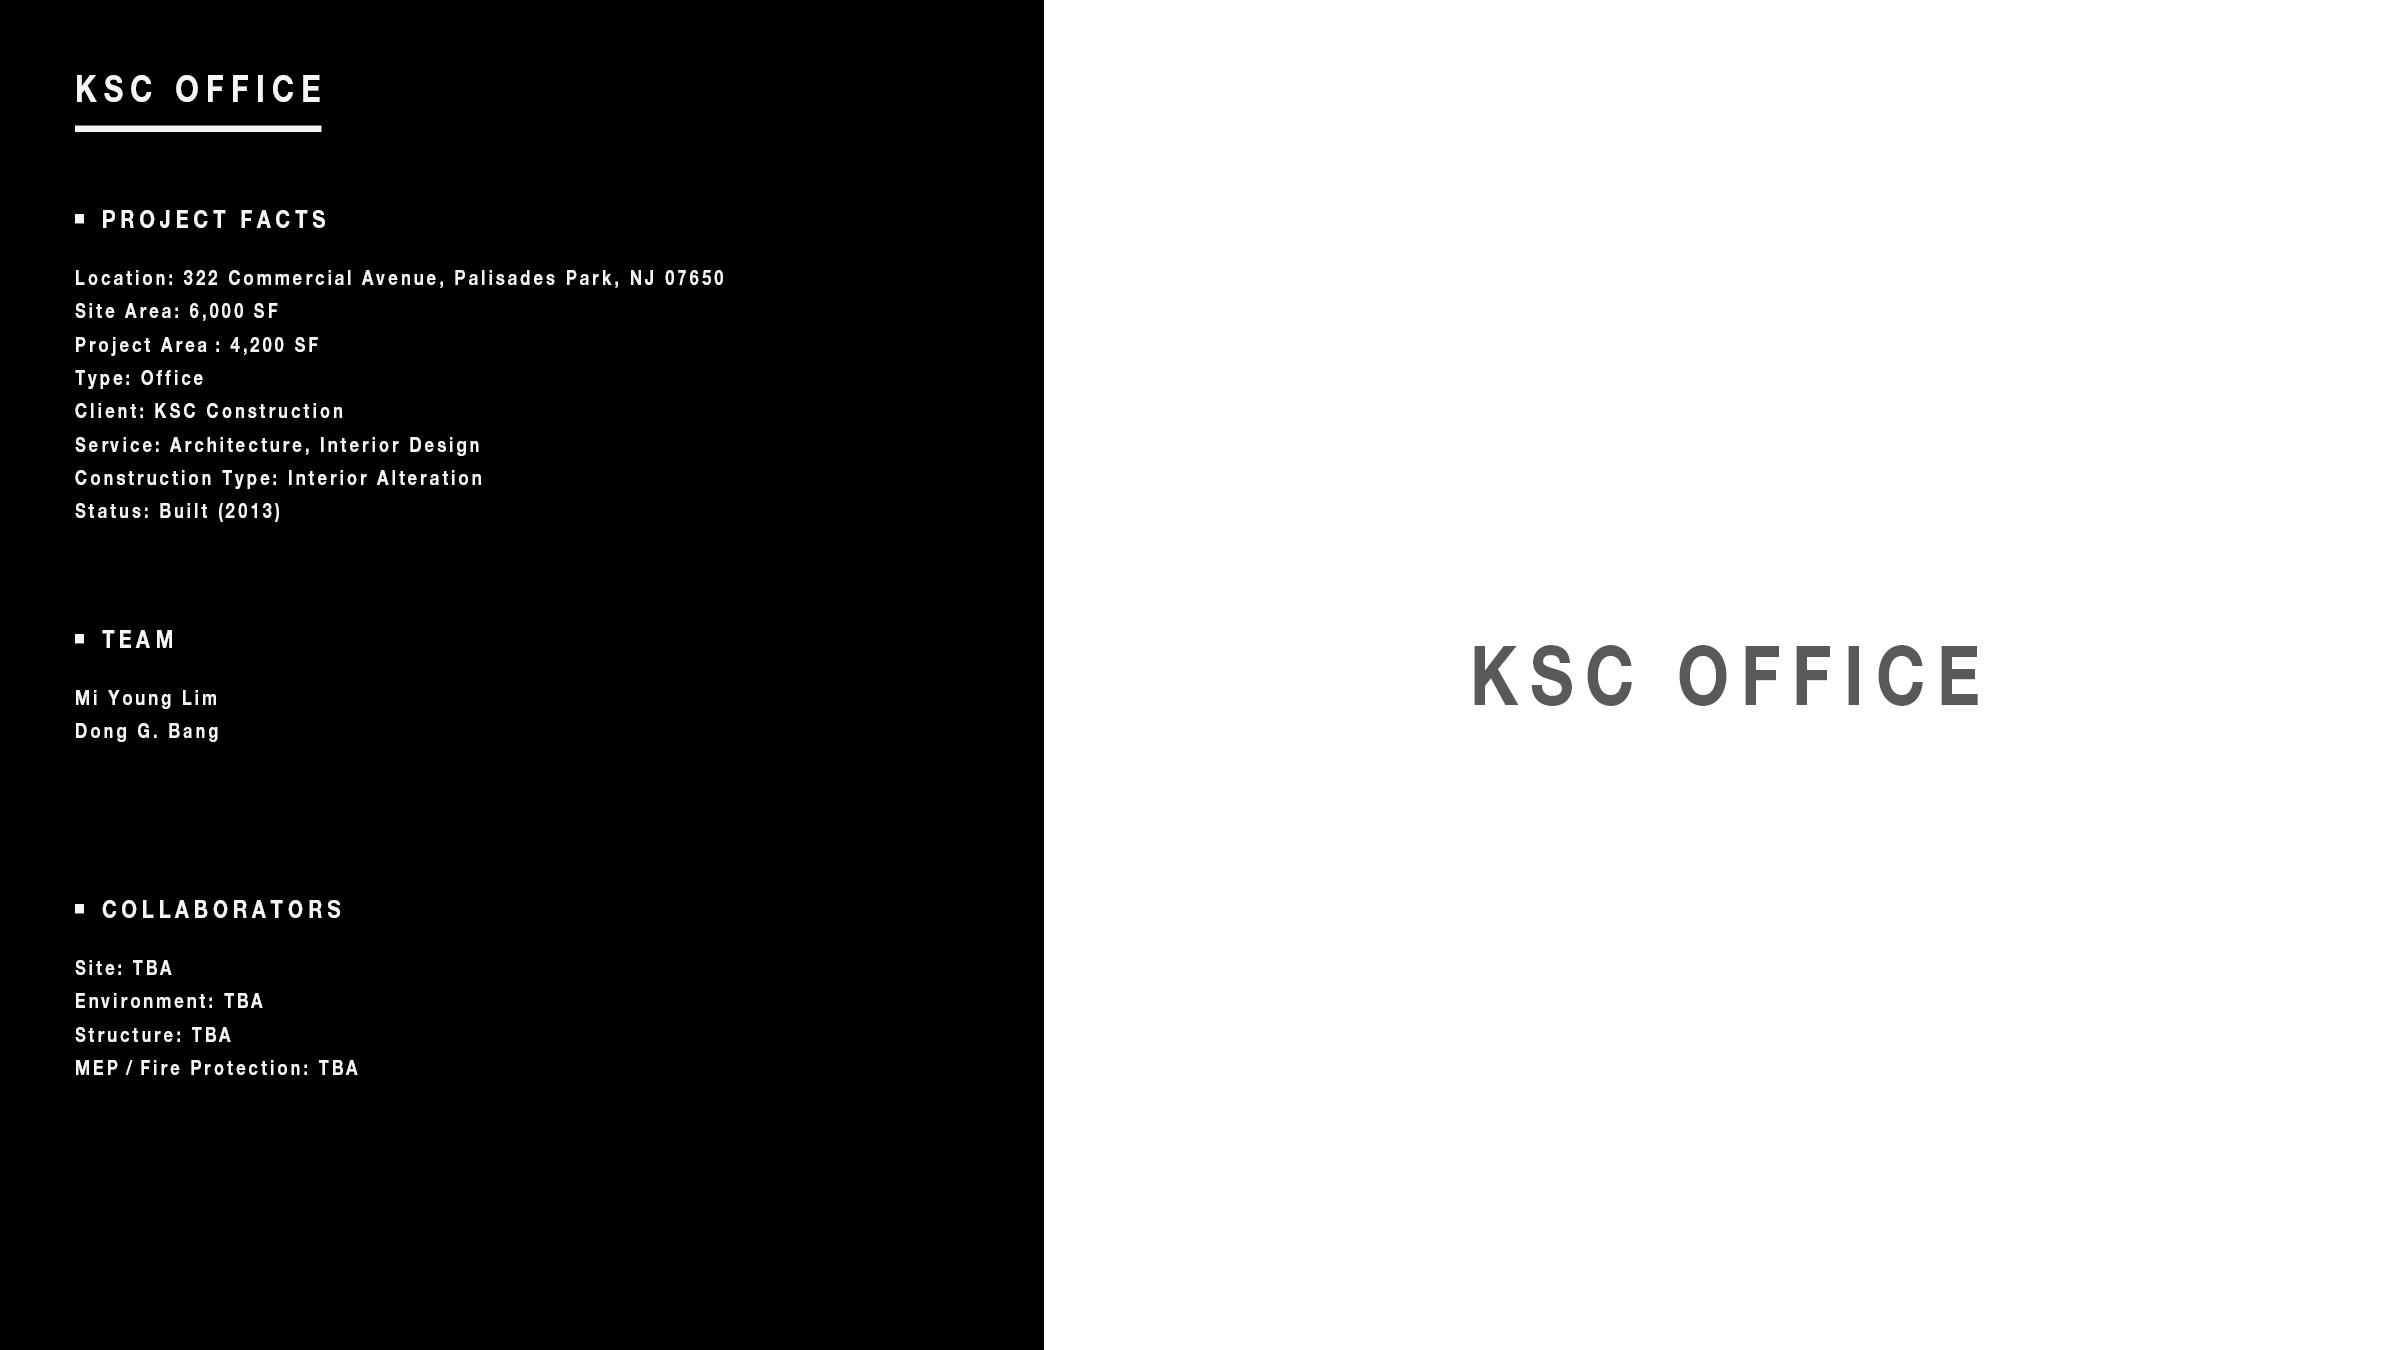 Pioli_KSC Office.png